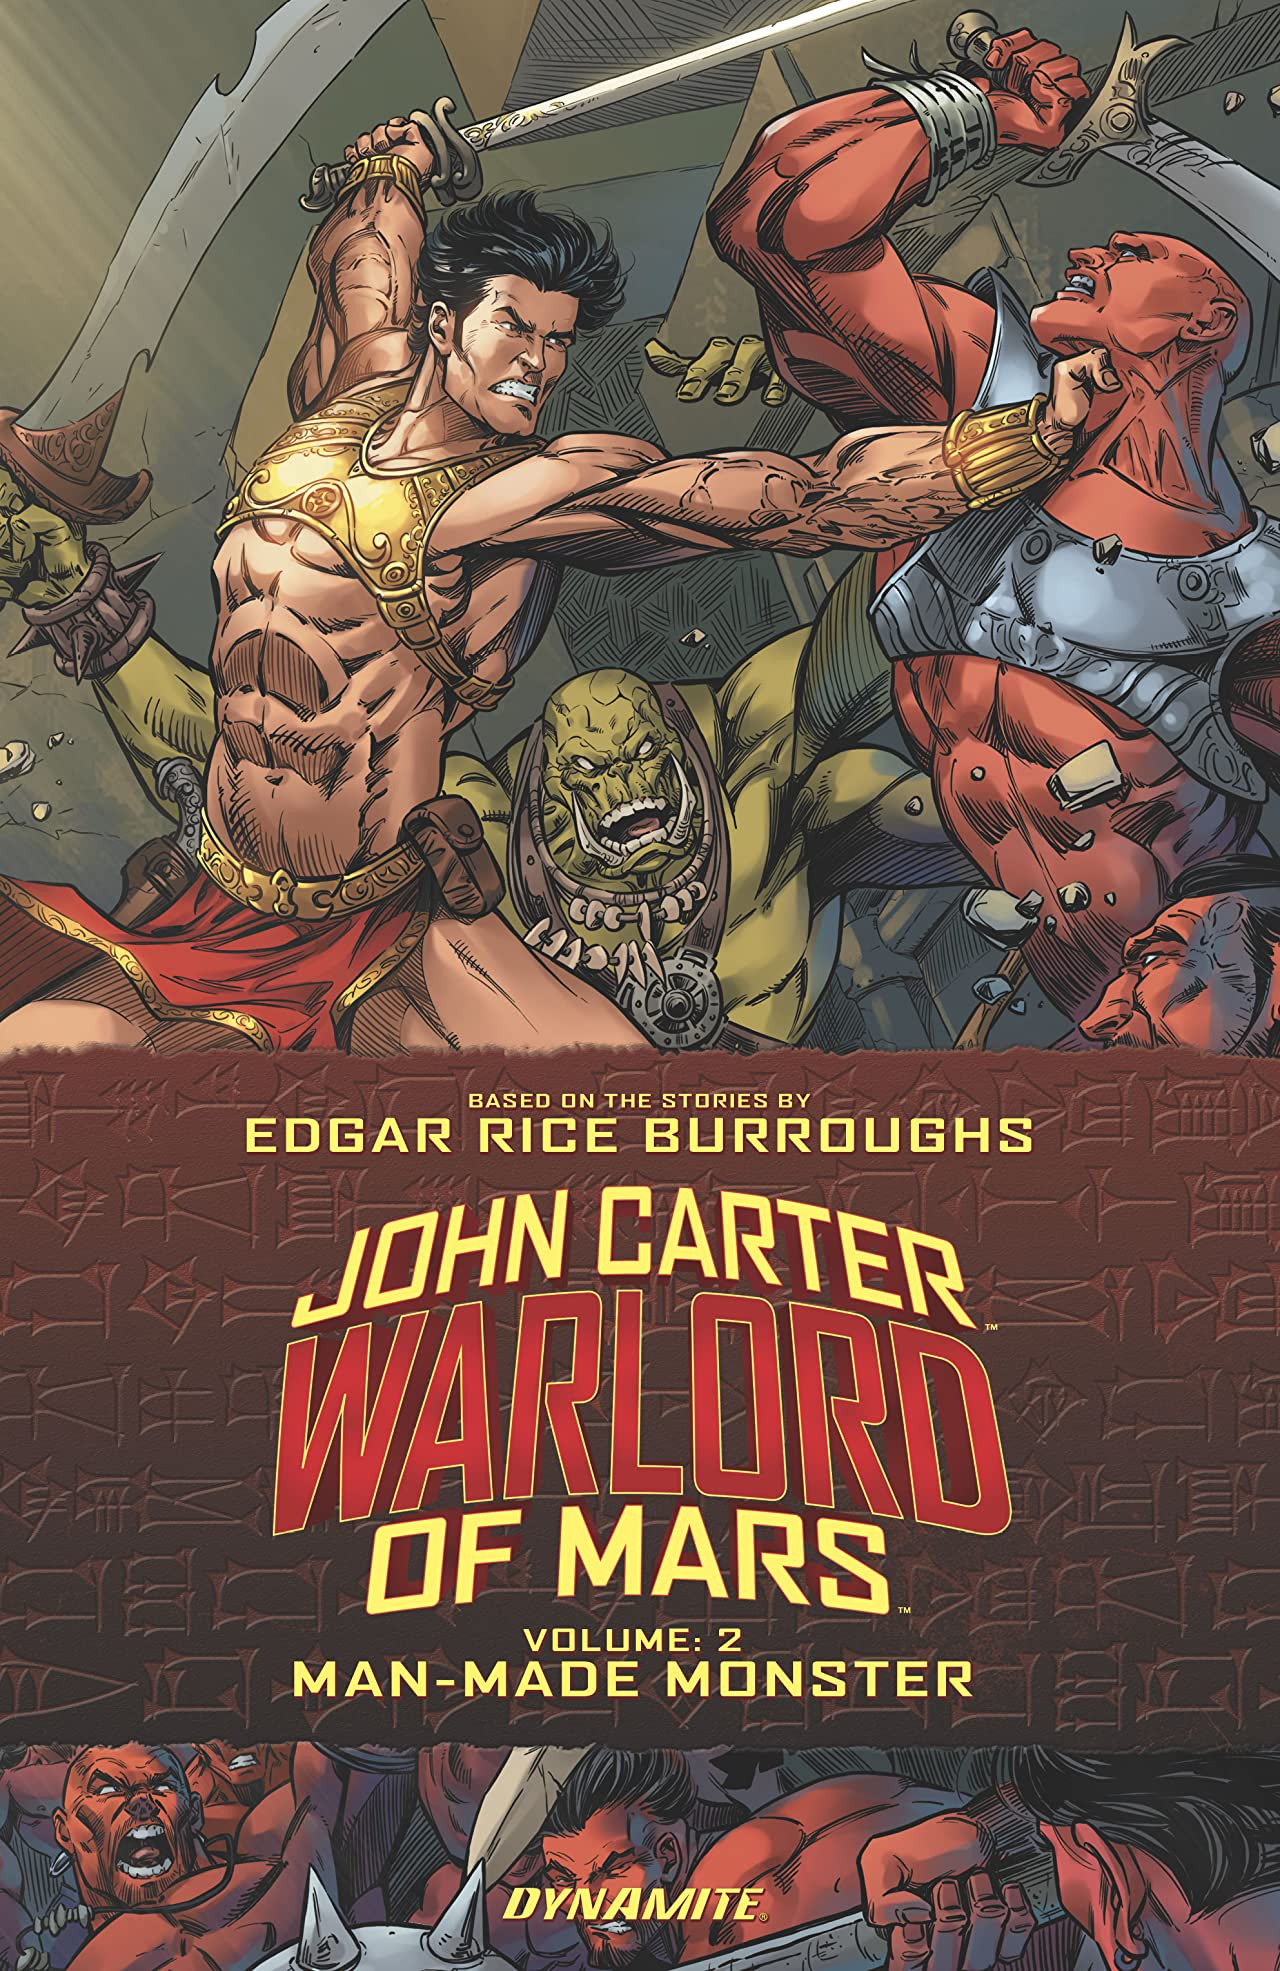 John Carter: Warlord Of Mars Vol. 2: Man Made Monster